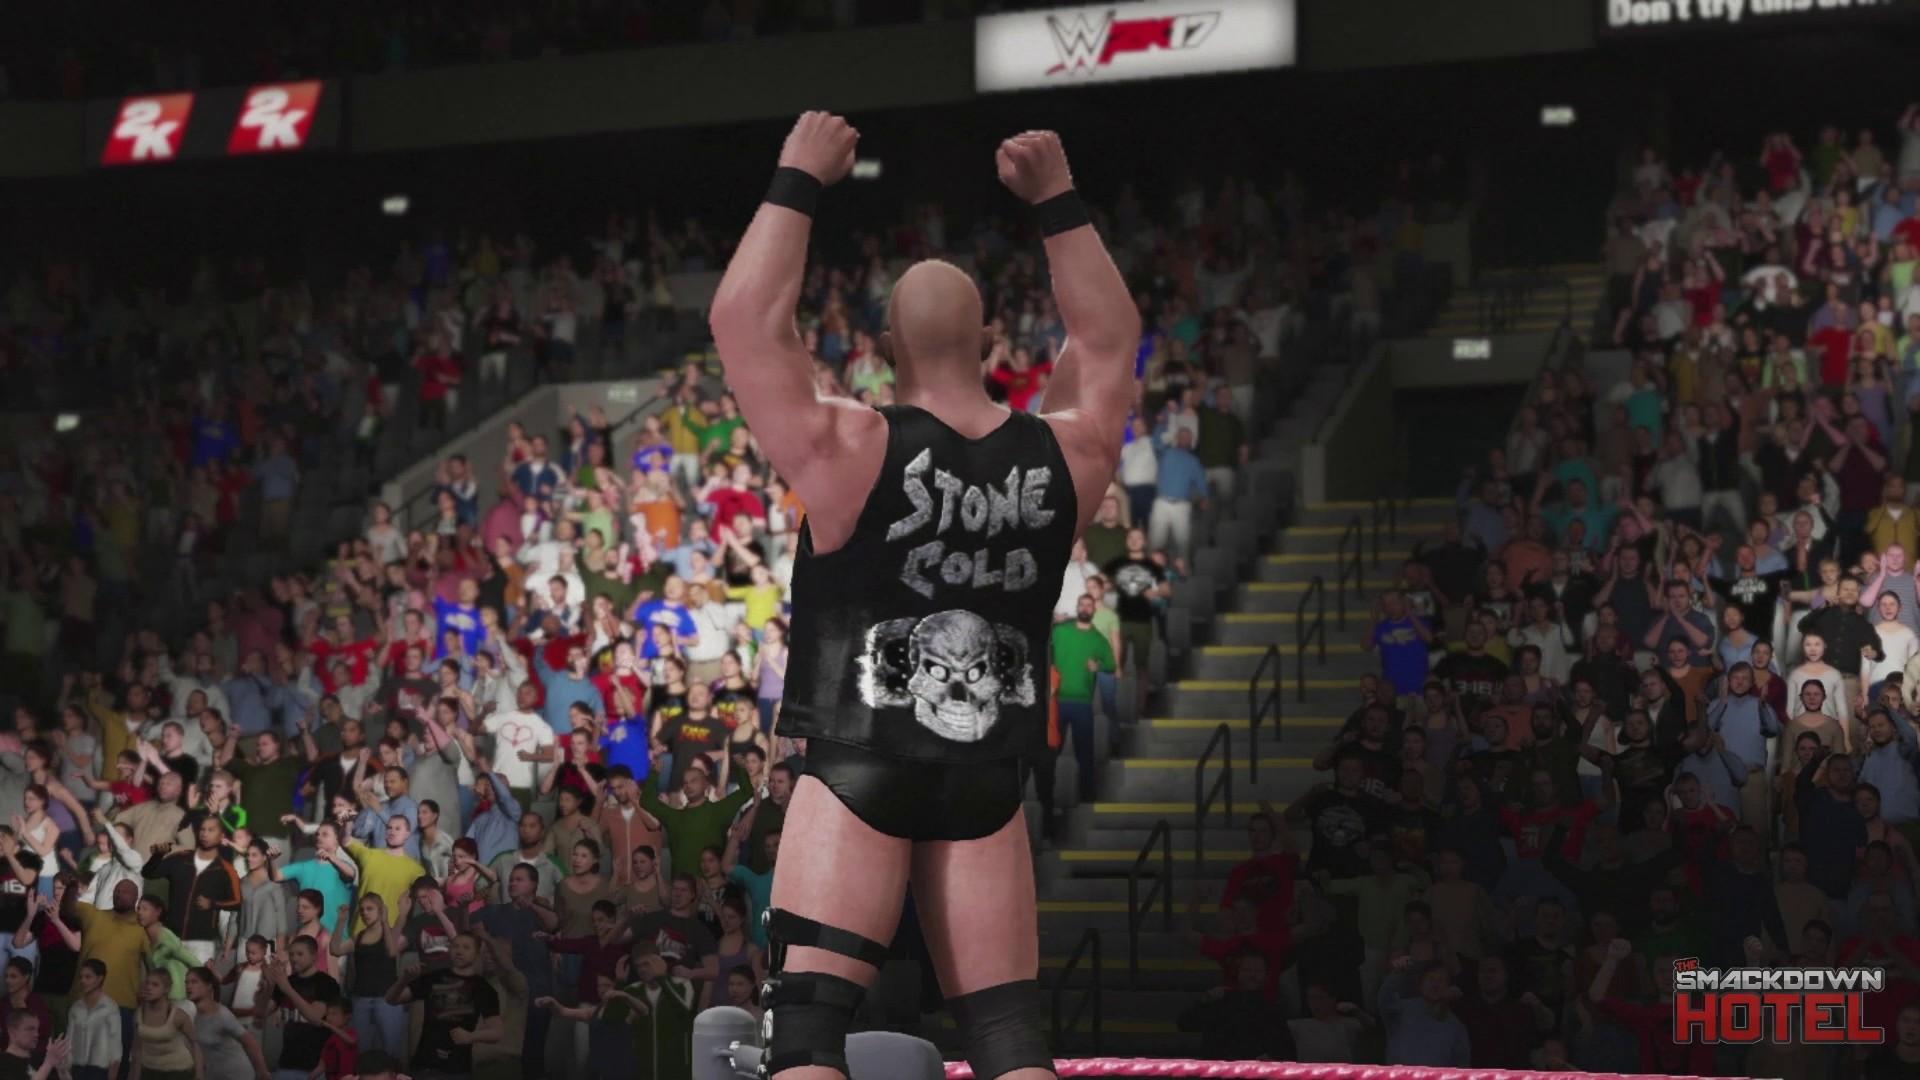 WWE2K17-PC-Austin-Rock10 WWE2K17-StoneCold-SteveAustin WWE2K17-Trailer-Stone -Cold-Steve-Austin …